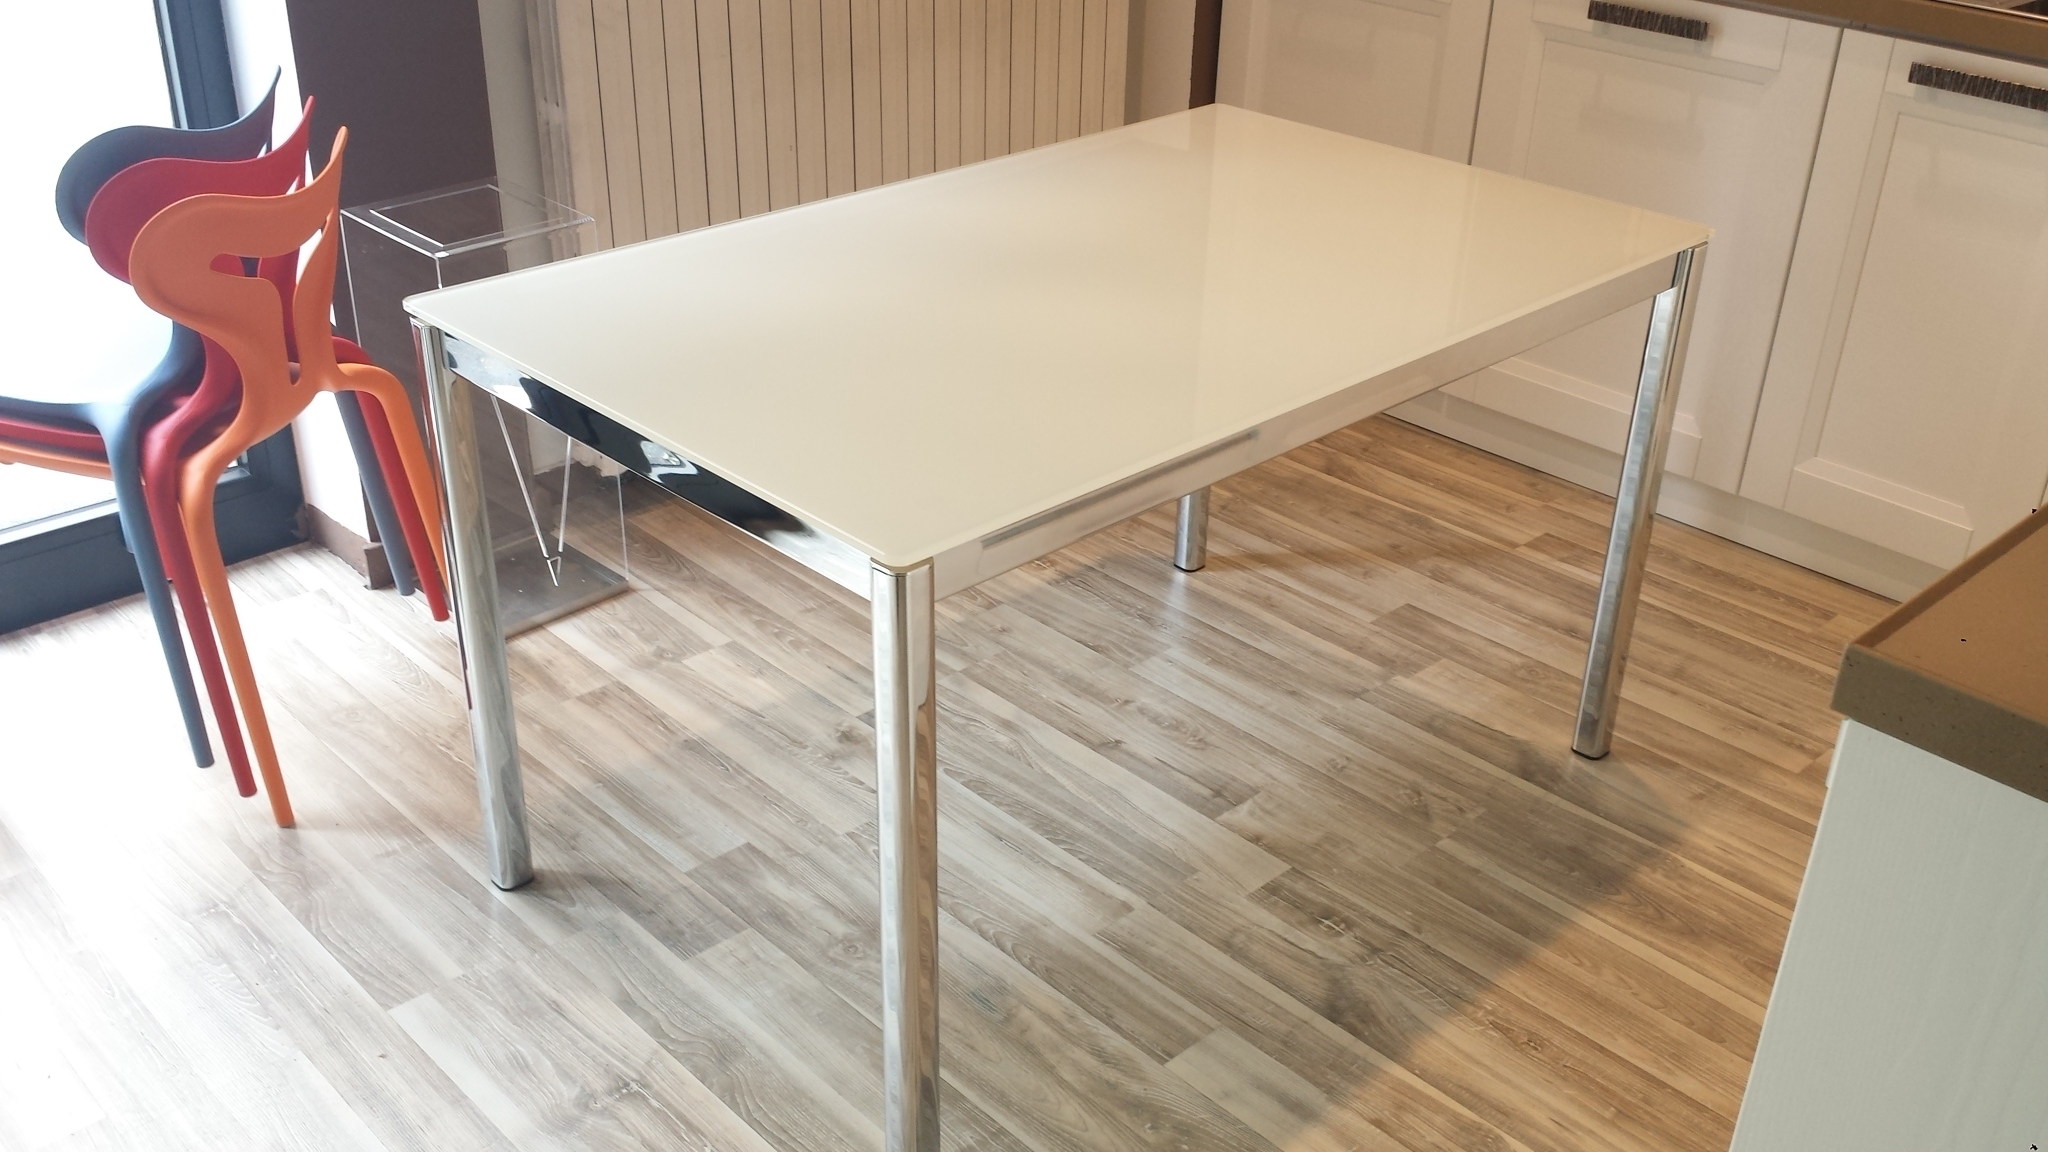 Tavolo da cucina allungabile performance tavoli a prezzi for Tavolo da cucina allungabile rettangolare